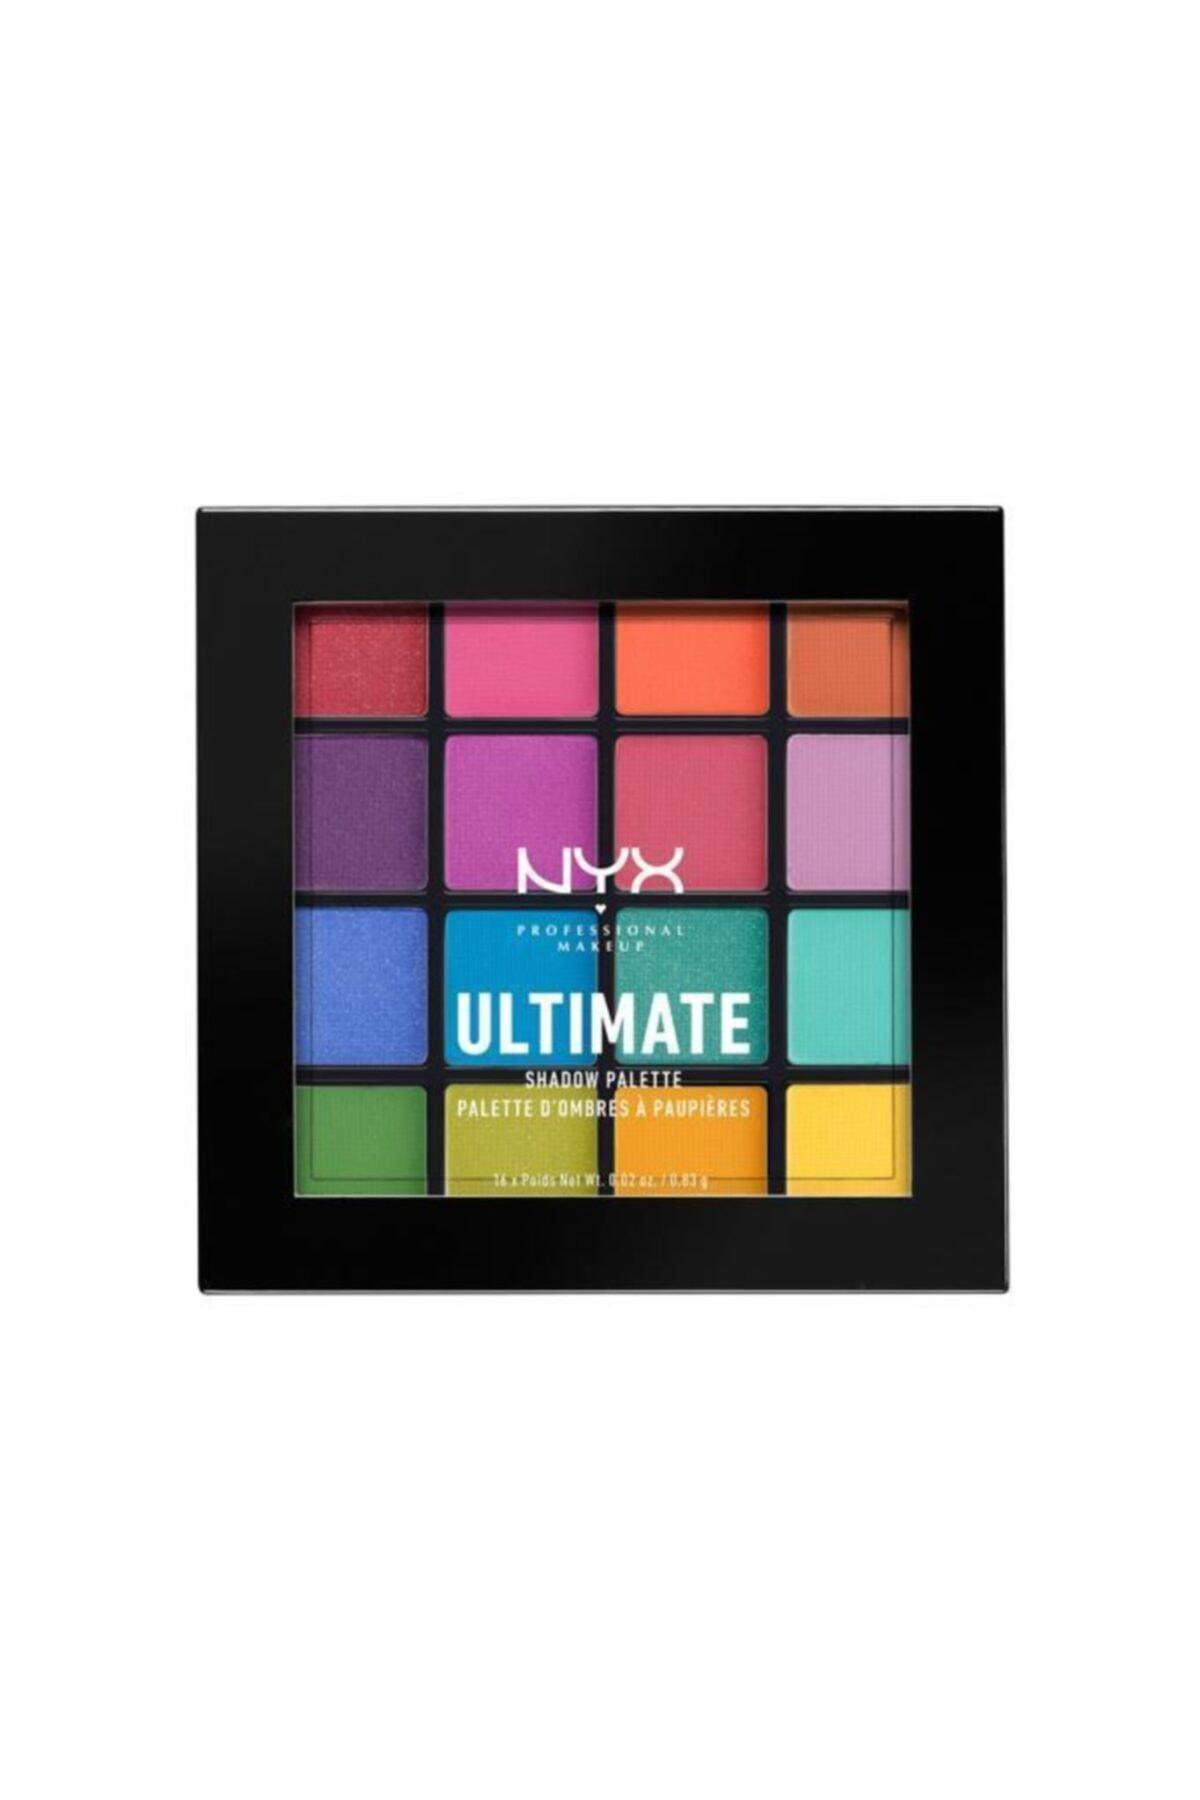 NYX Professional Makeup Vegan Renkli Makyaj Seti & Çanta Hediyeli 2